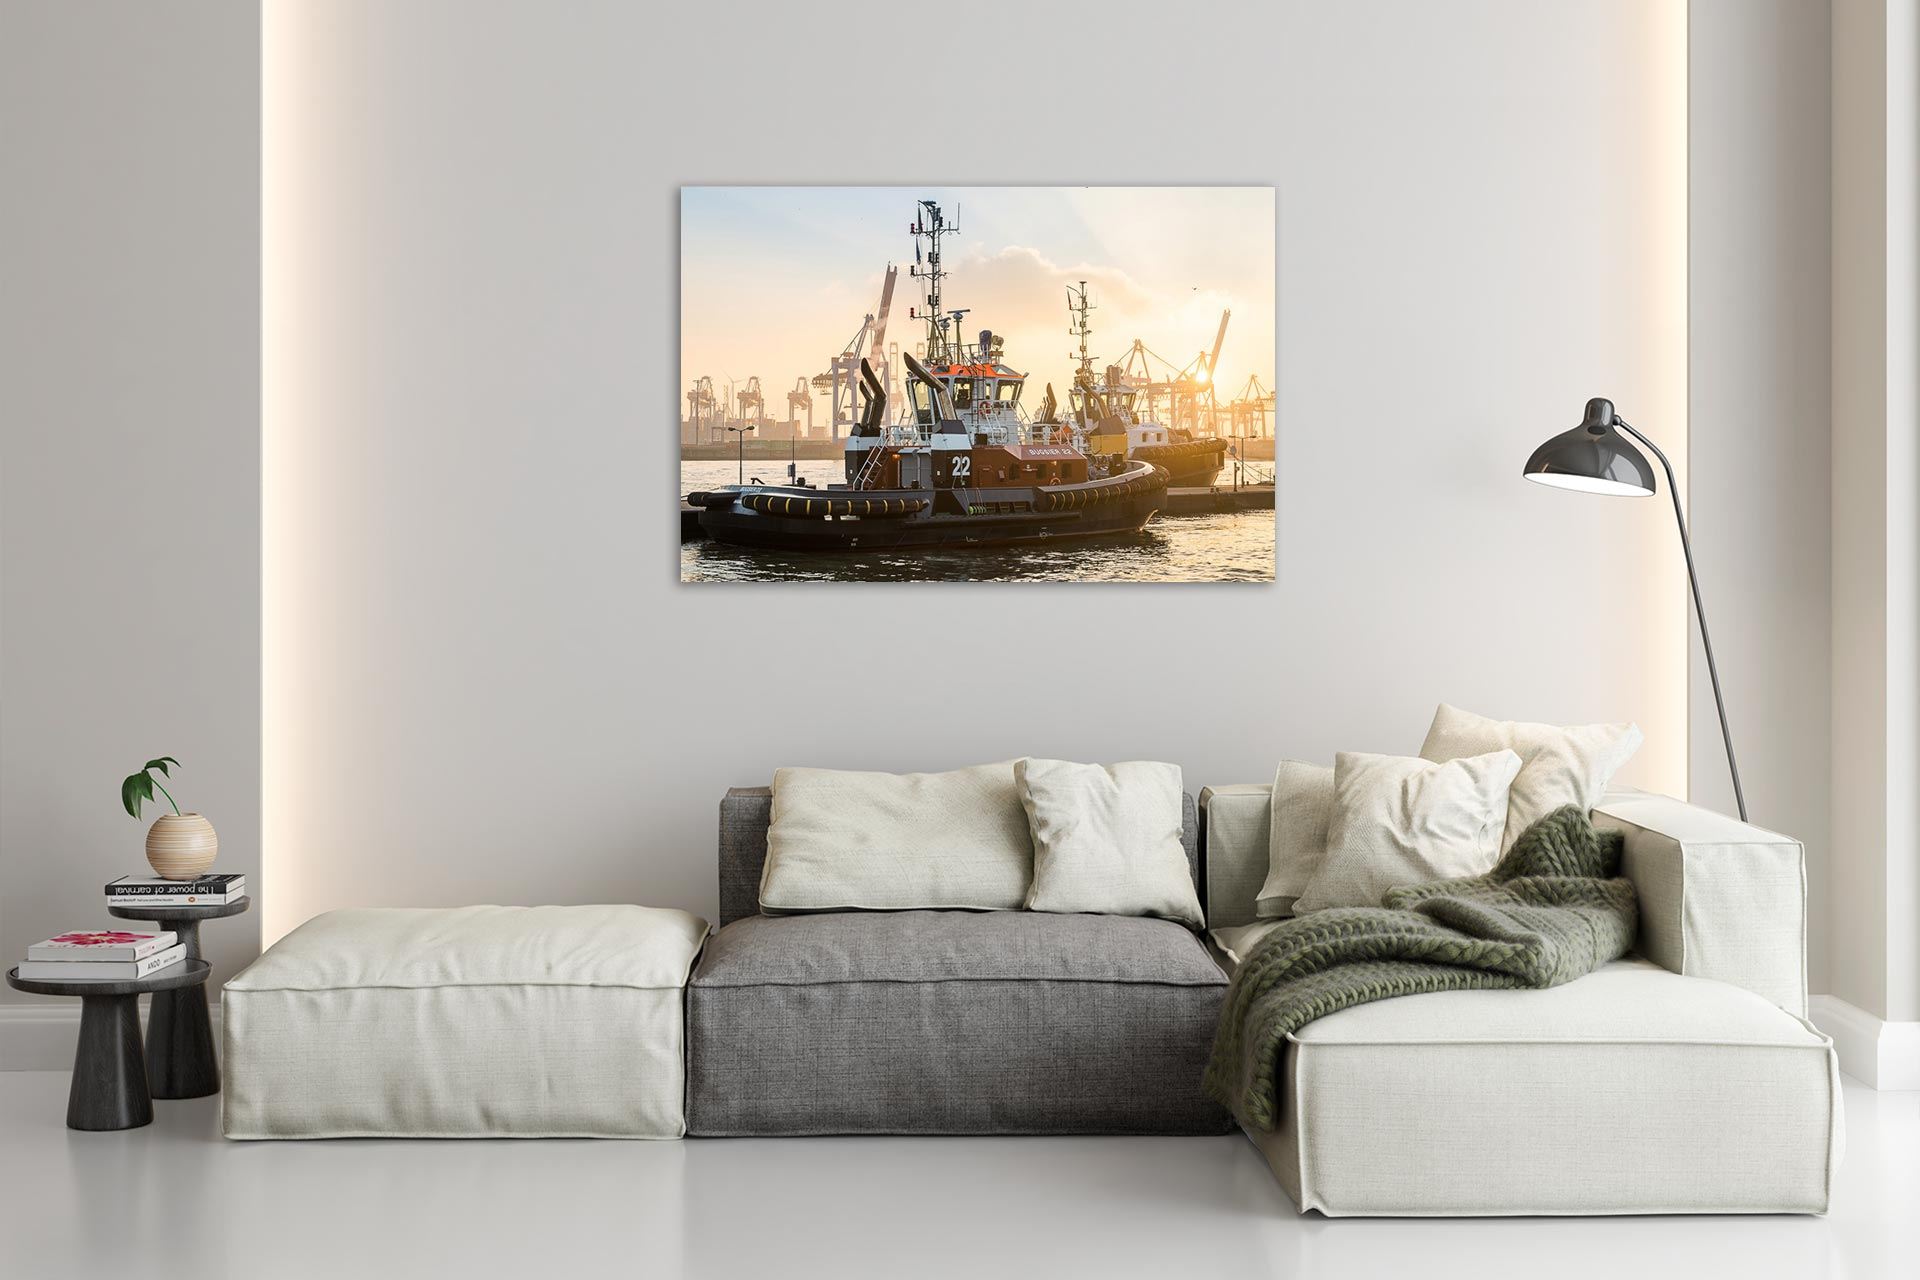 JS060-bugsier-22-wandbild-bild-auf-leinwand-acrylglas-aludibond-wohnzimmer